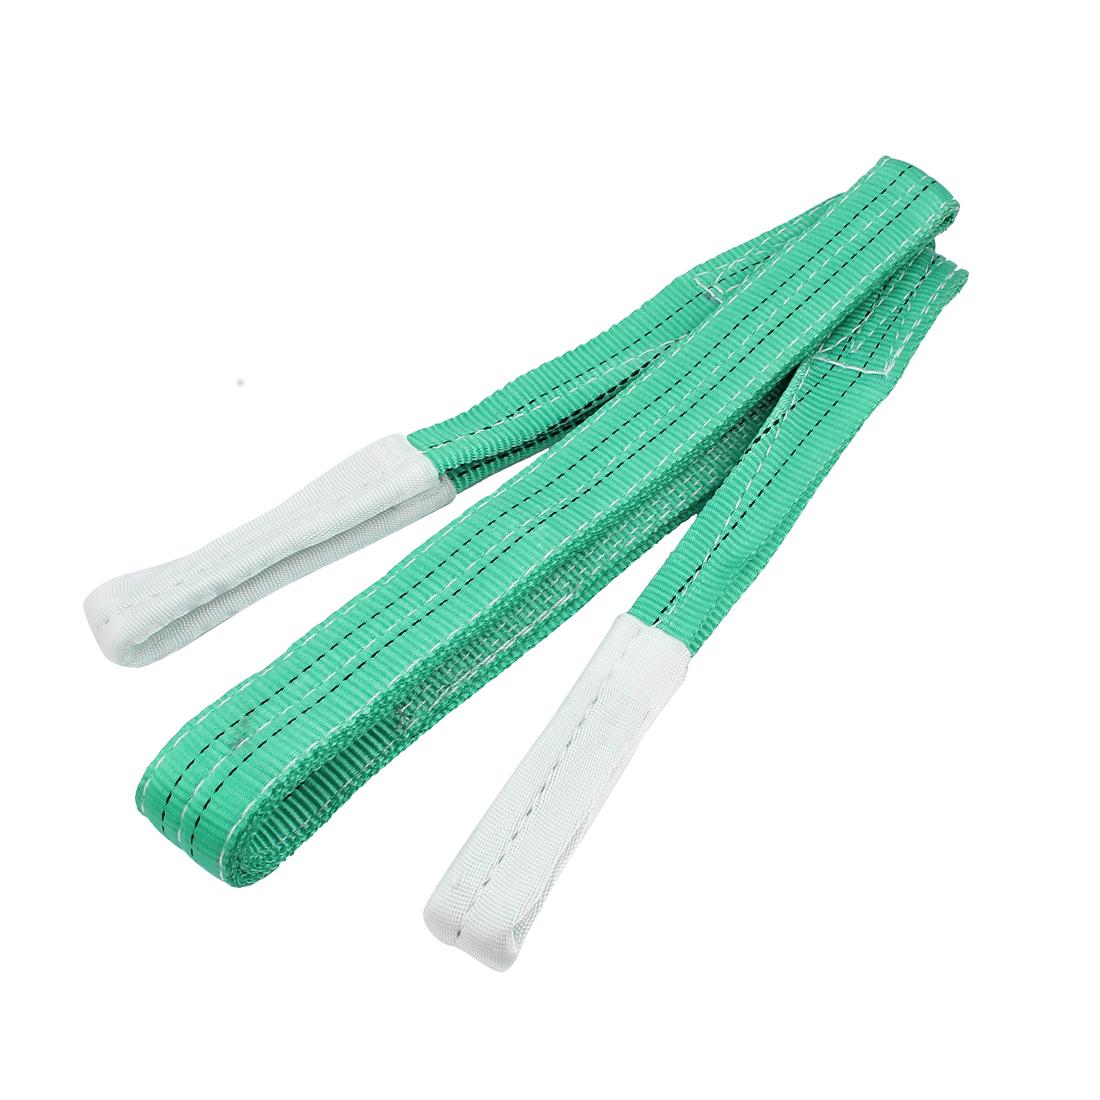 3 Meter 50mm Width Eye to Eye Nylon Web Lifting Tow Strap Green